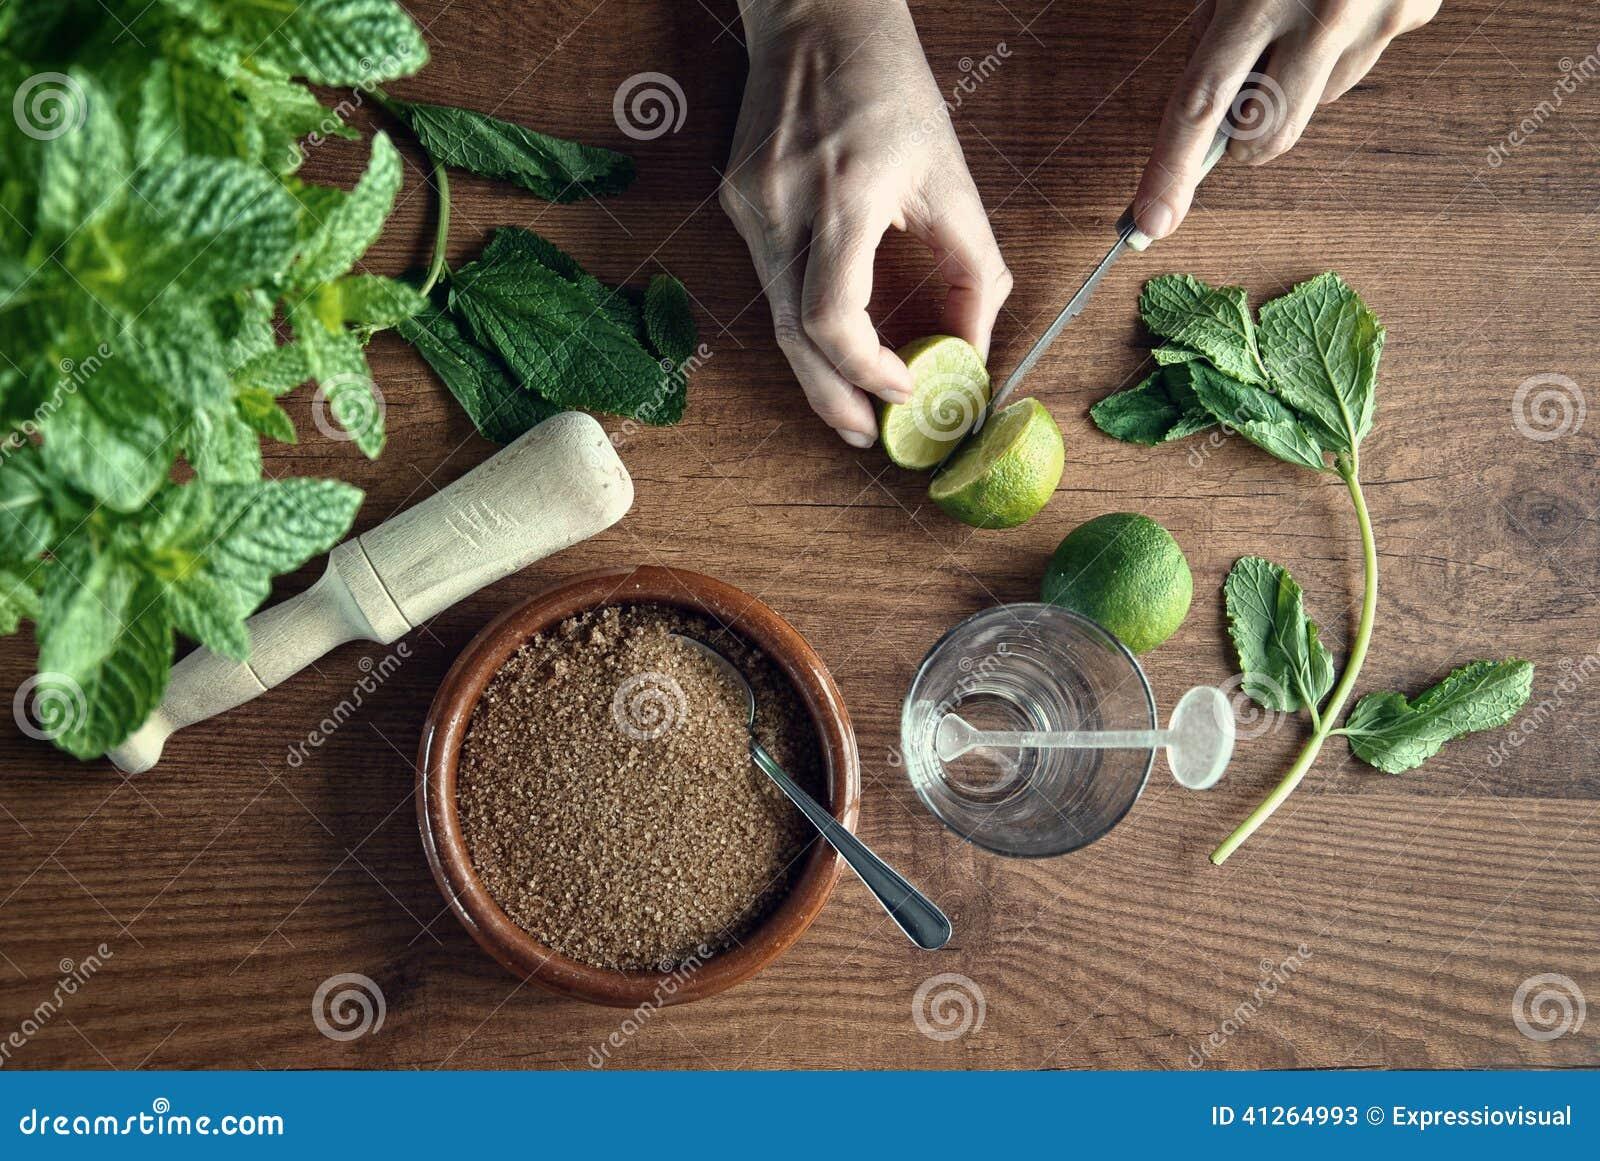 Handen die mojitococktail voorbereiden